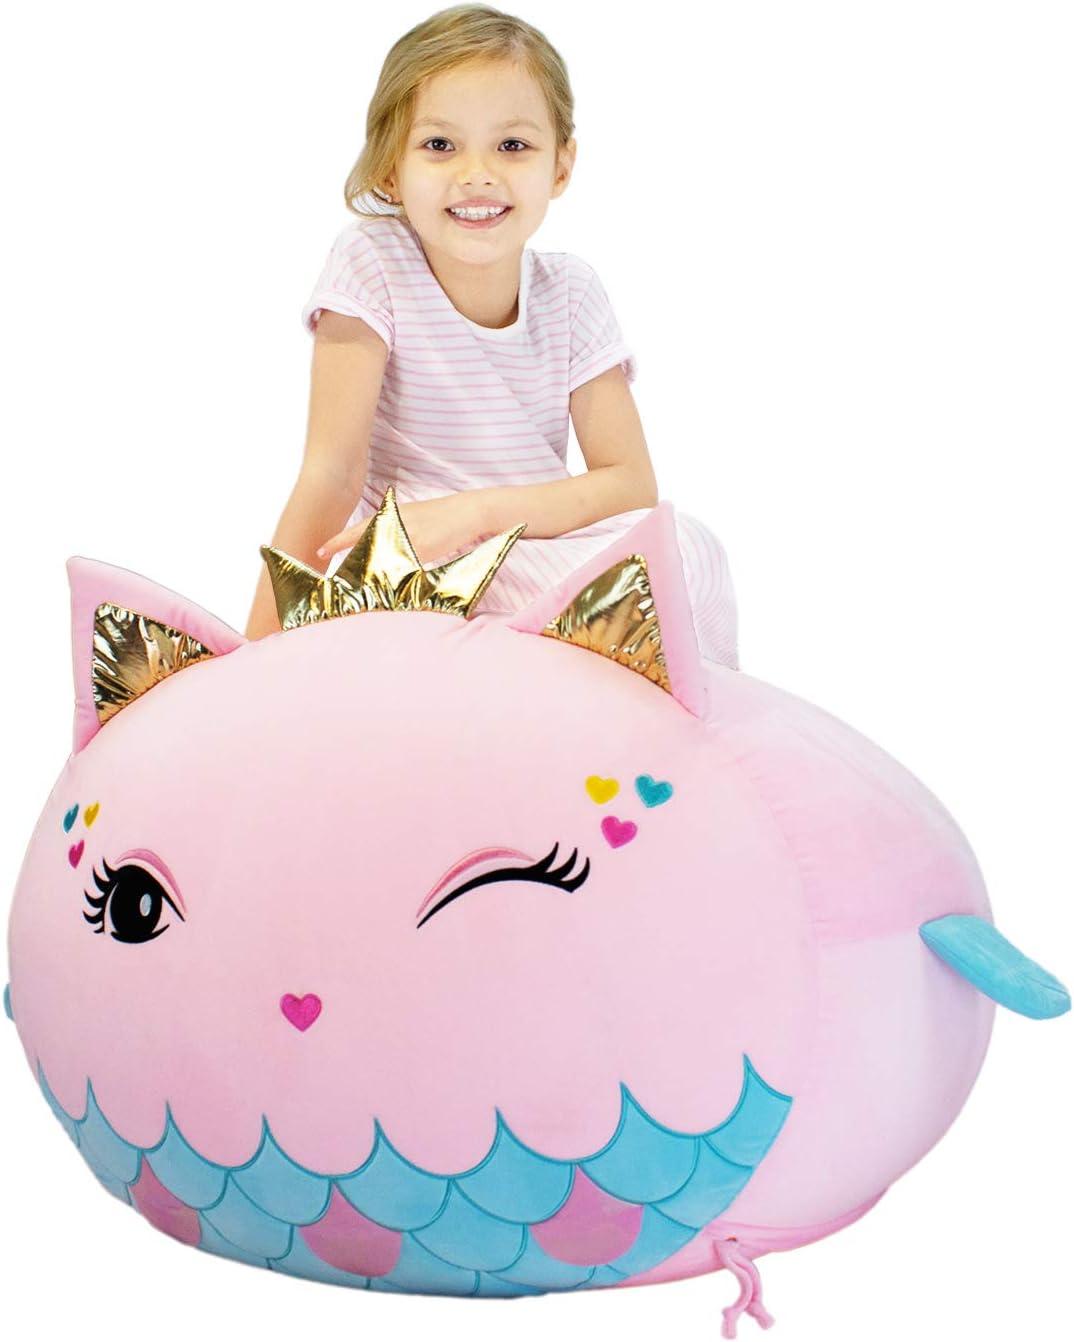 Yoweenton Mermaid Stuffed Animal Toy Kids Storage Cheap sale Very popular Cha Bag Bean